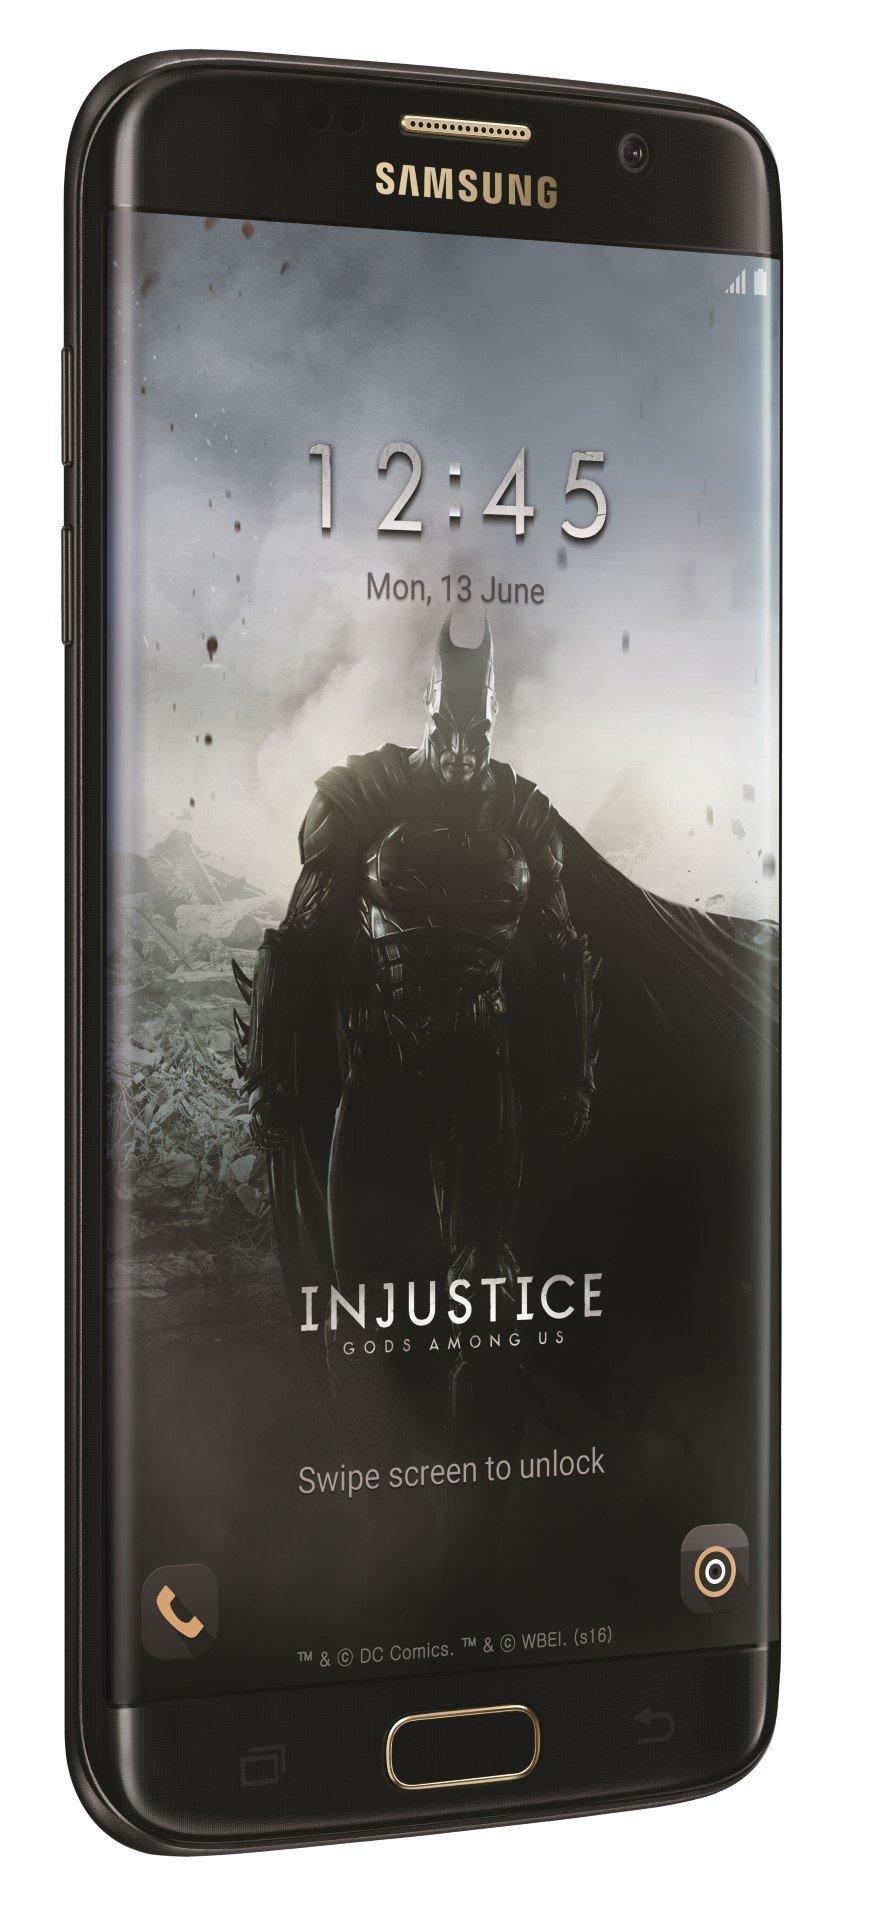 Samsung Galaxy S7 Edge - Batman Edition soll kommen 8